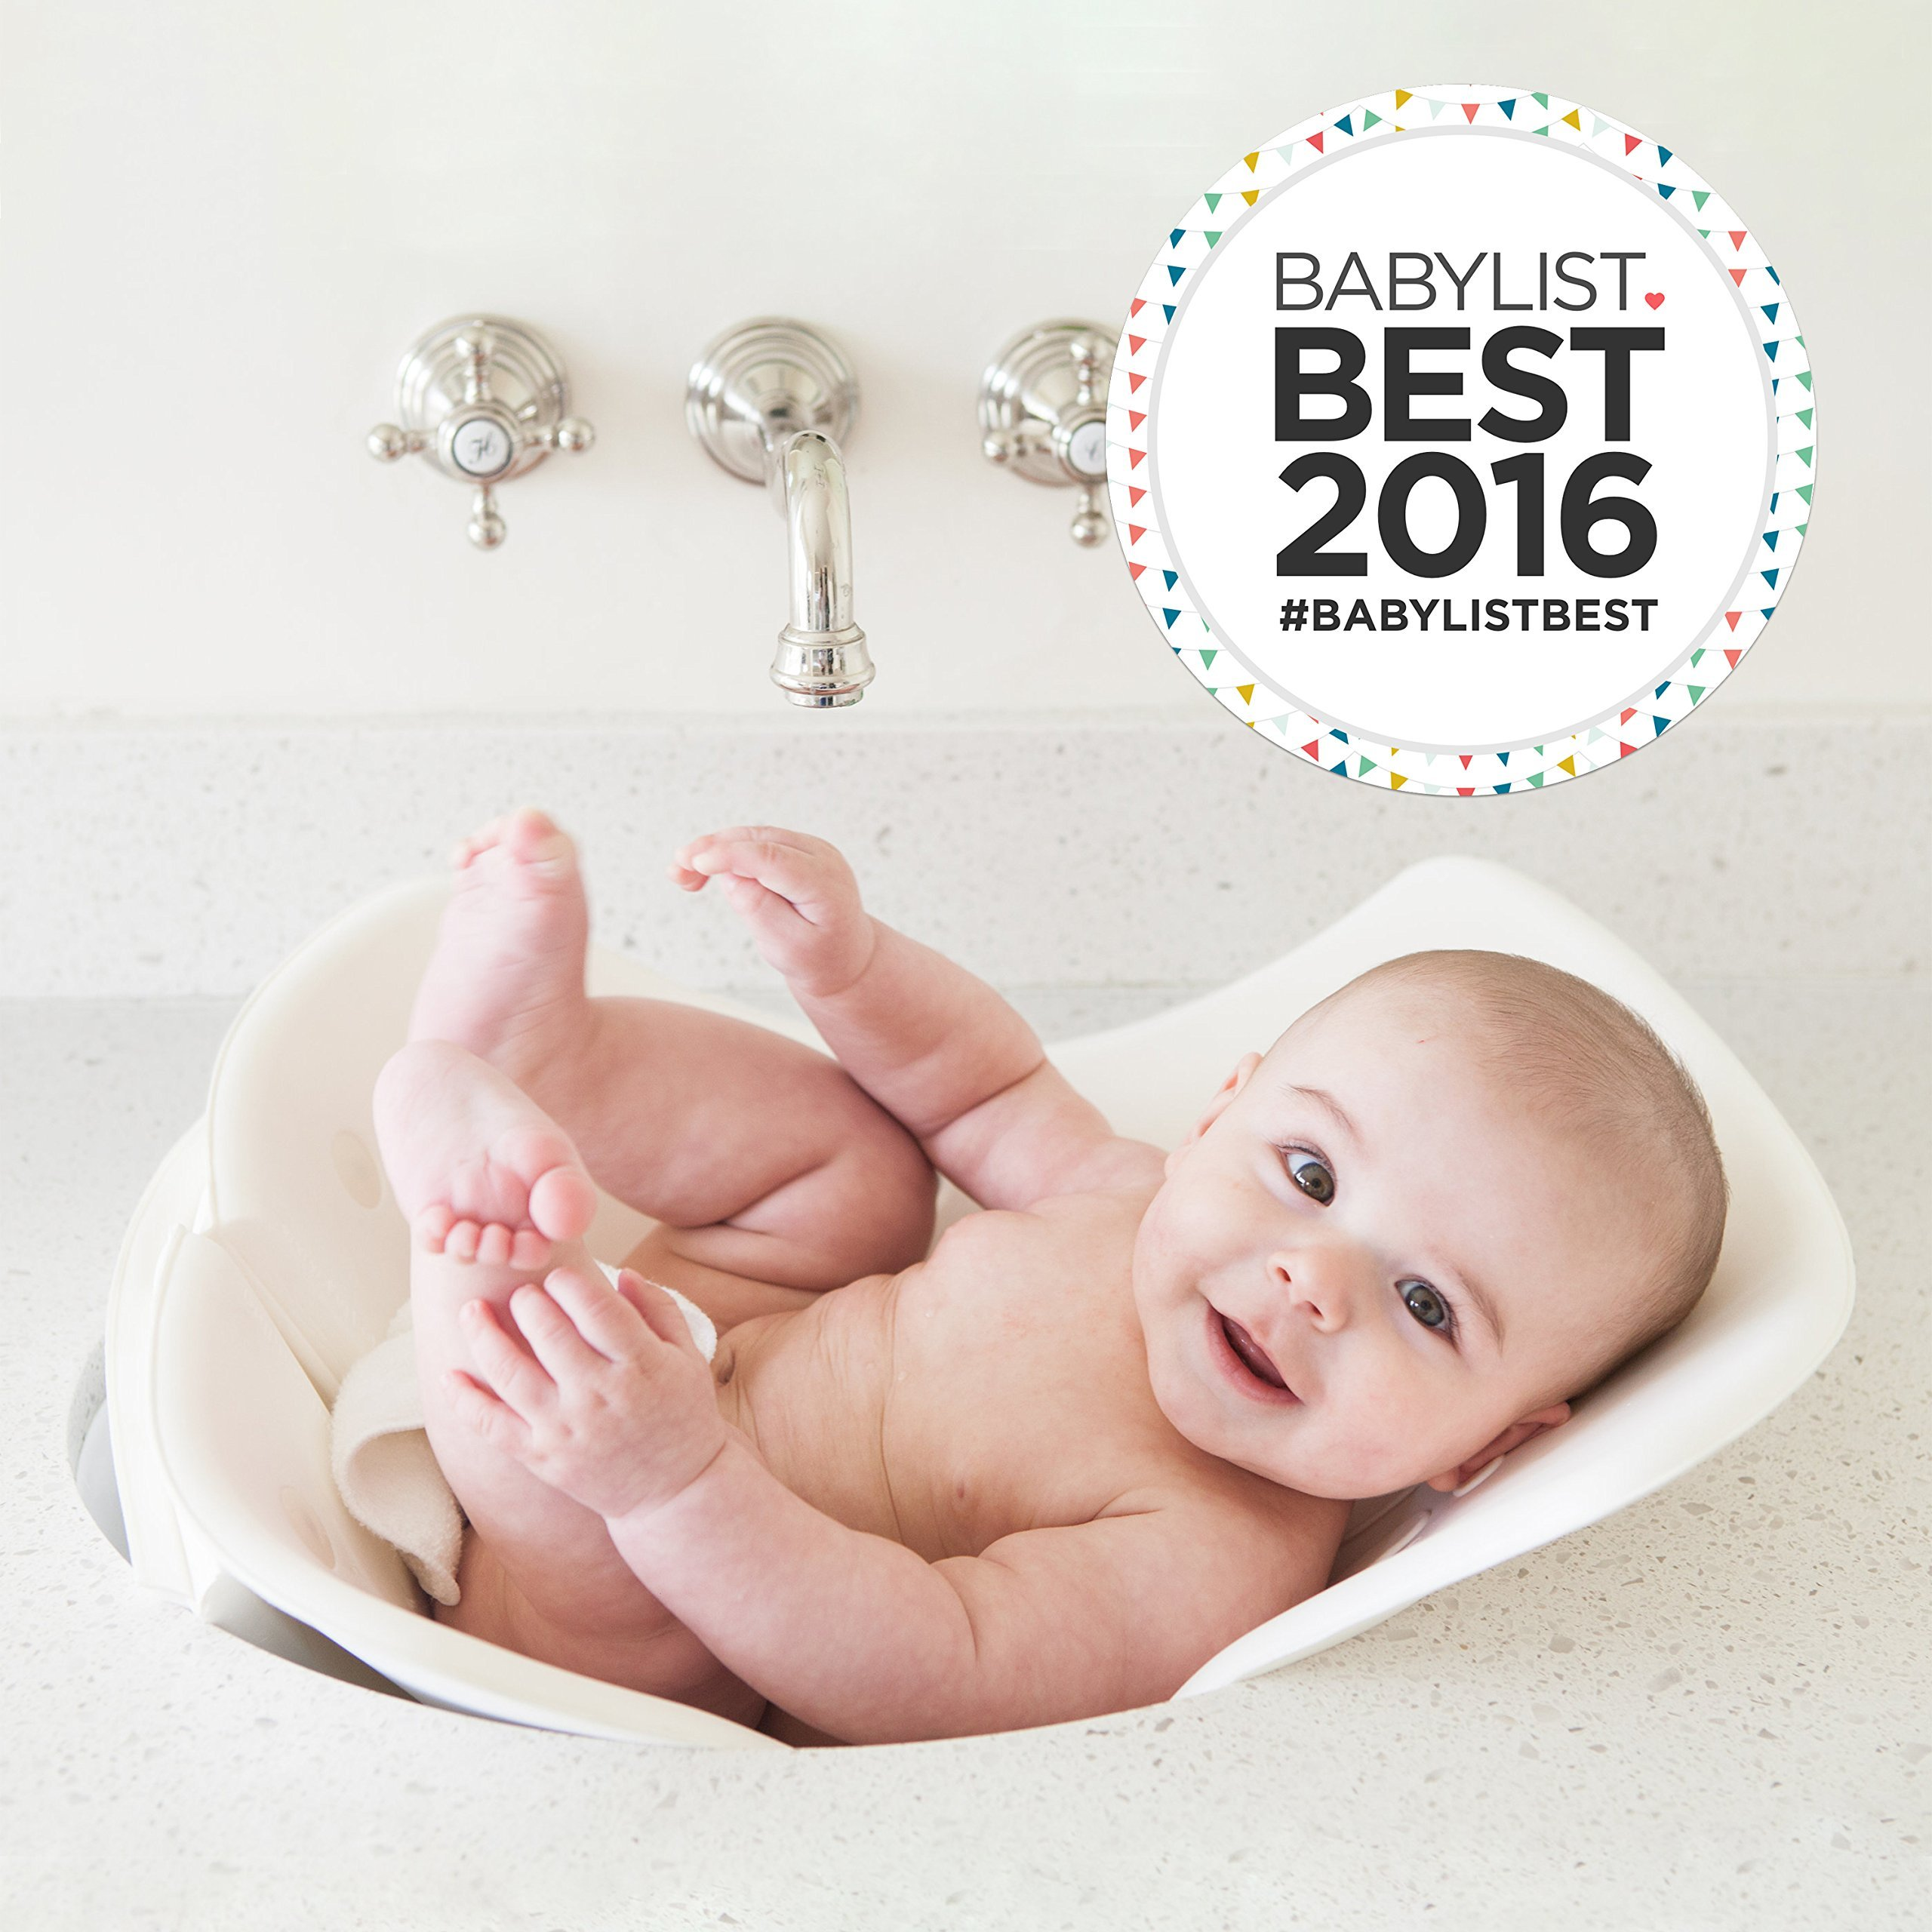 Puj Tub - The Soft, Foldable Baby Bathtub - Newborn, Infant, 0-6 Months, In-Sink Baby Bathtub, BPA free, PVC free (White) by Puj